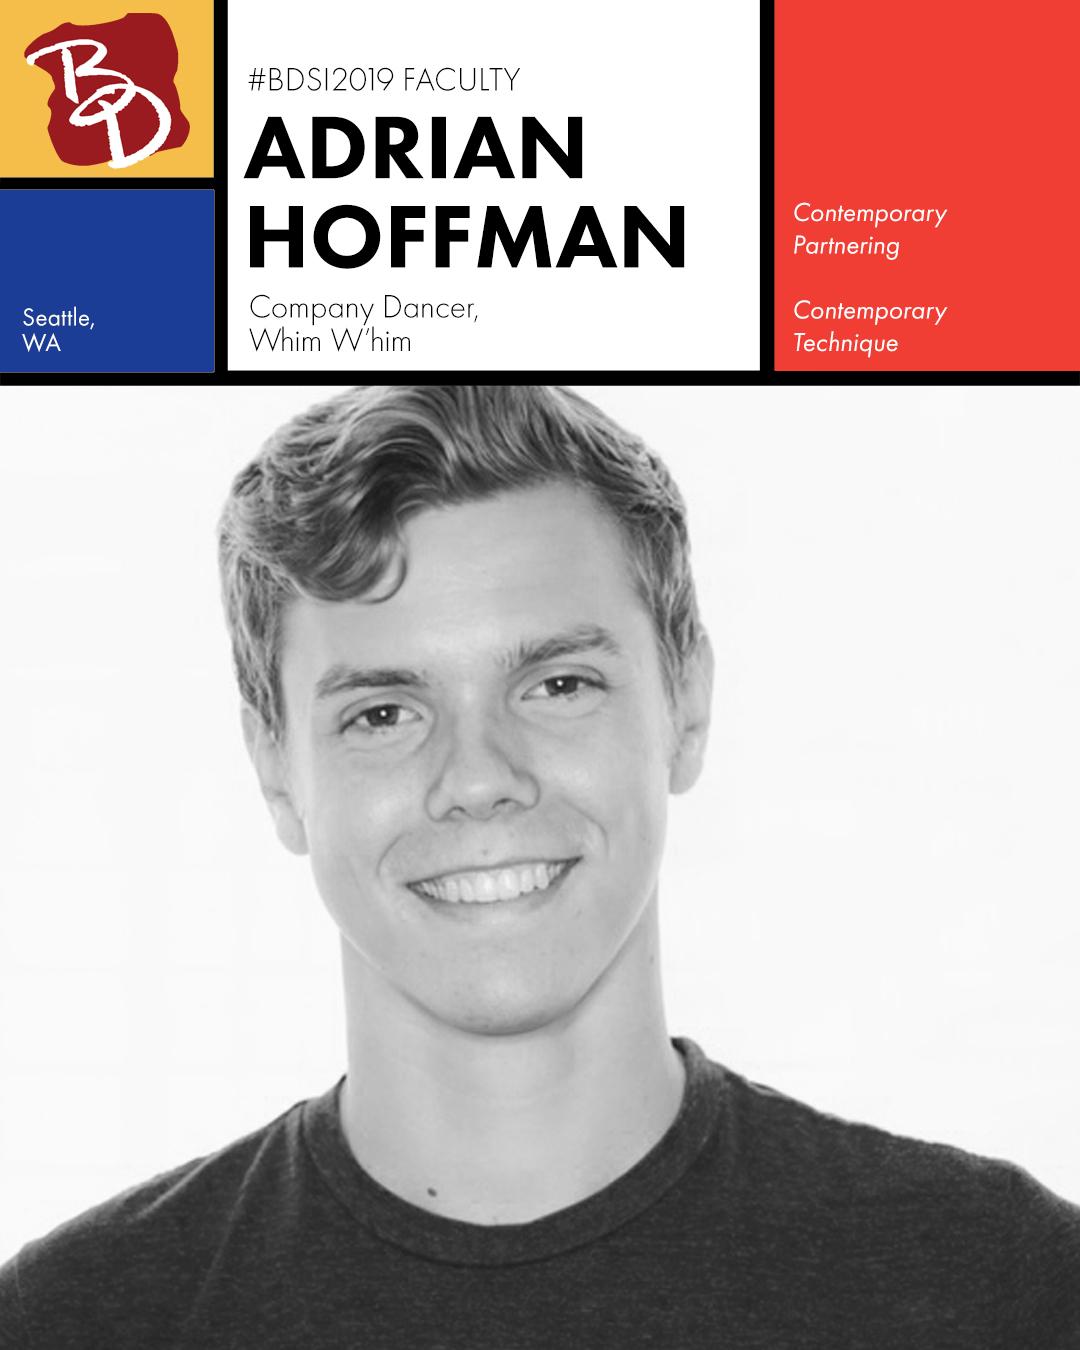 Faculty Announcement - Hoffman Adrian.jpg